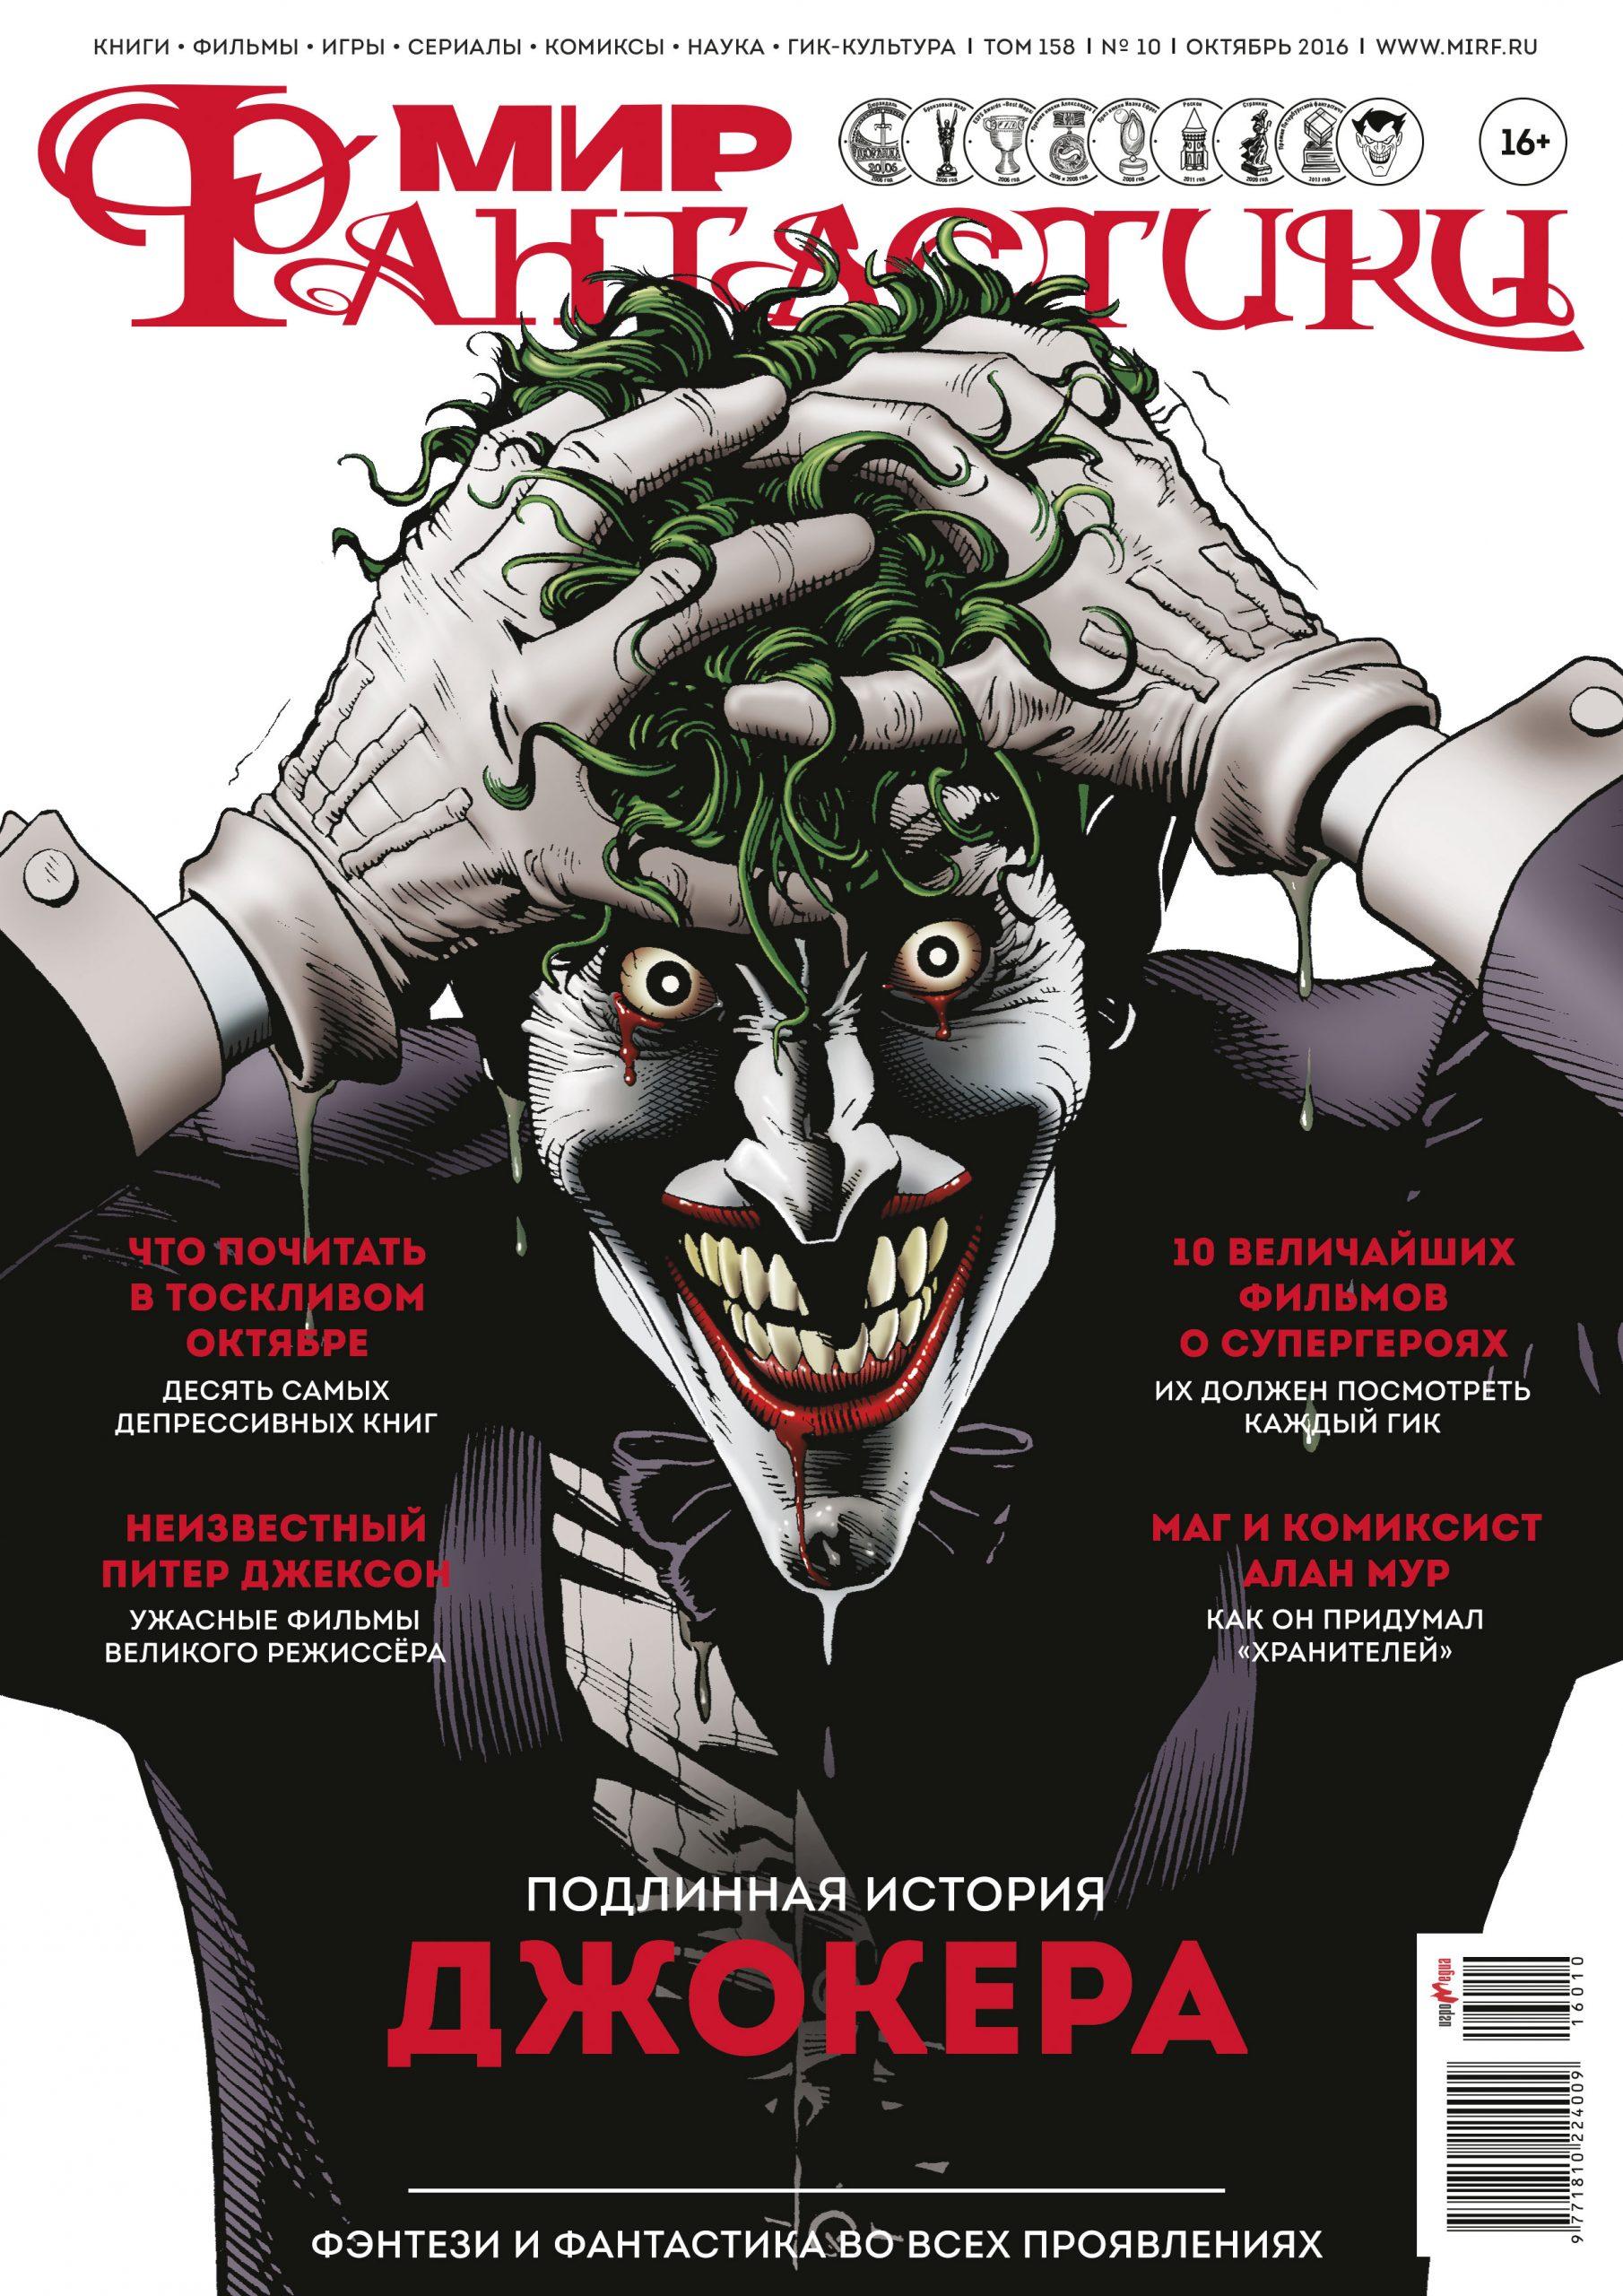 Мир фантастики №158 (октябрь2016) 8